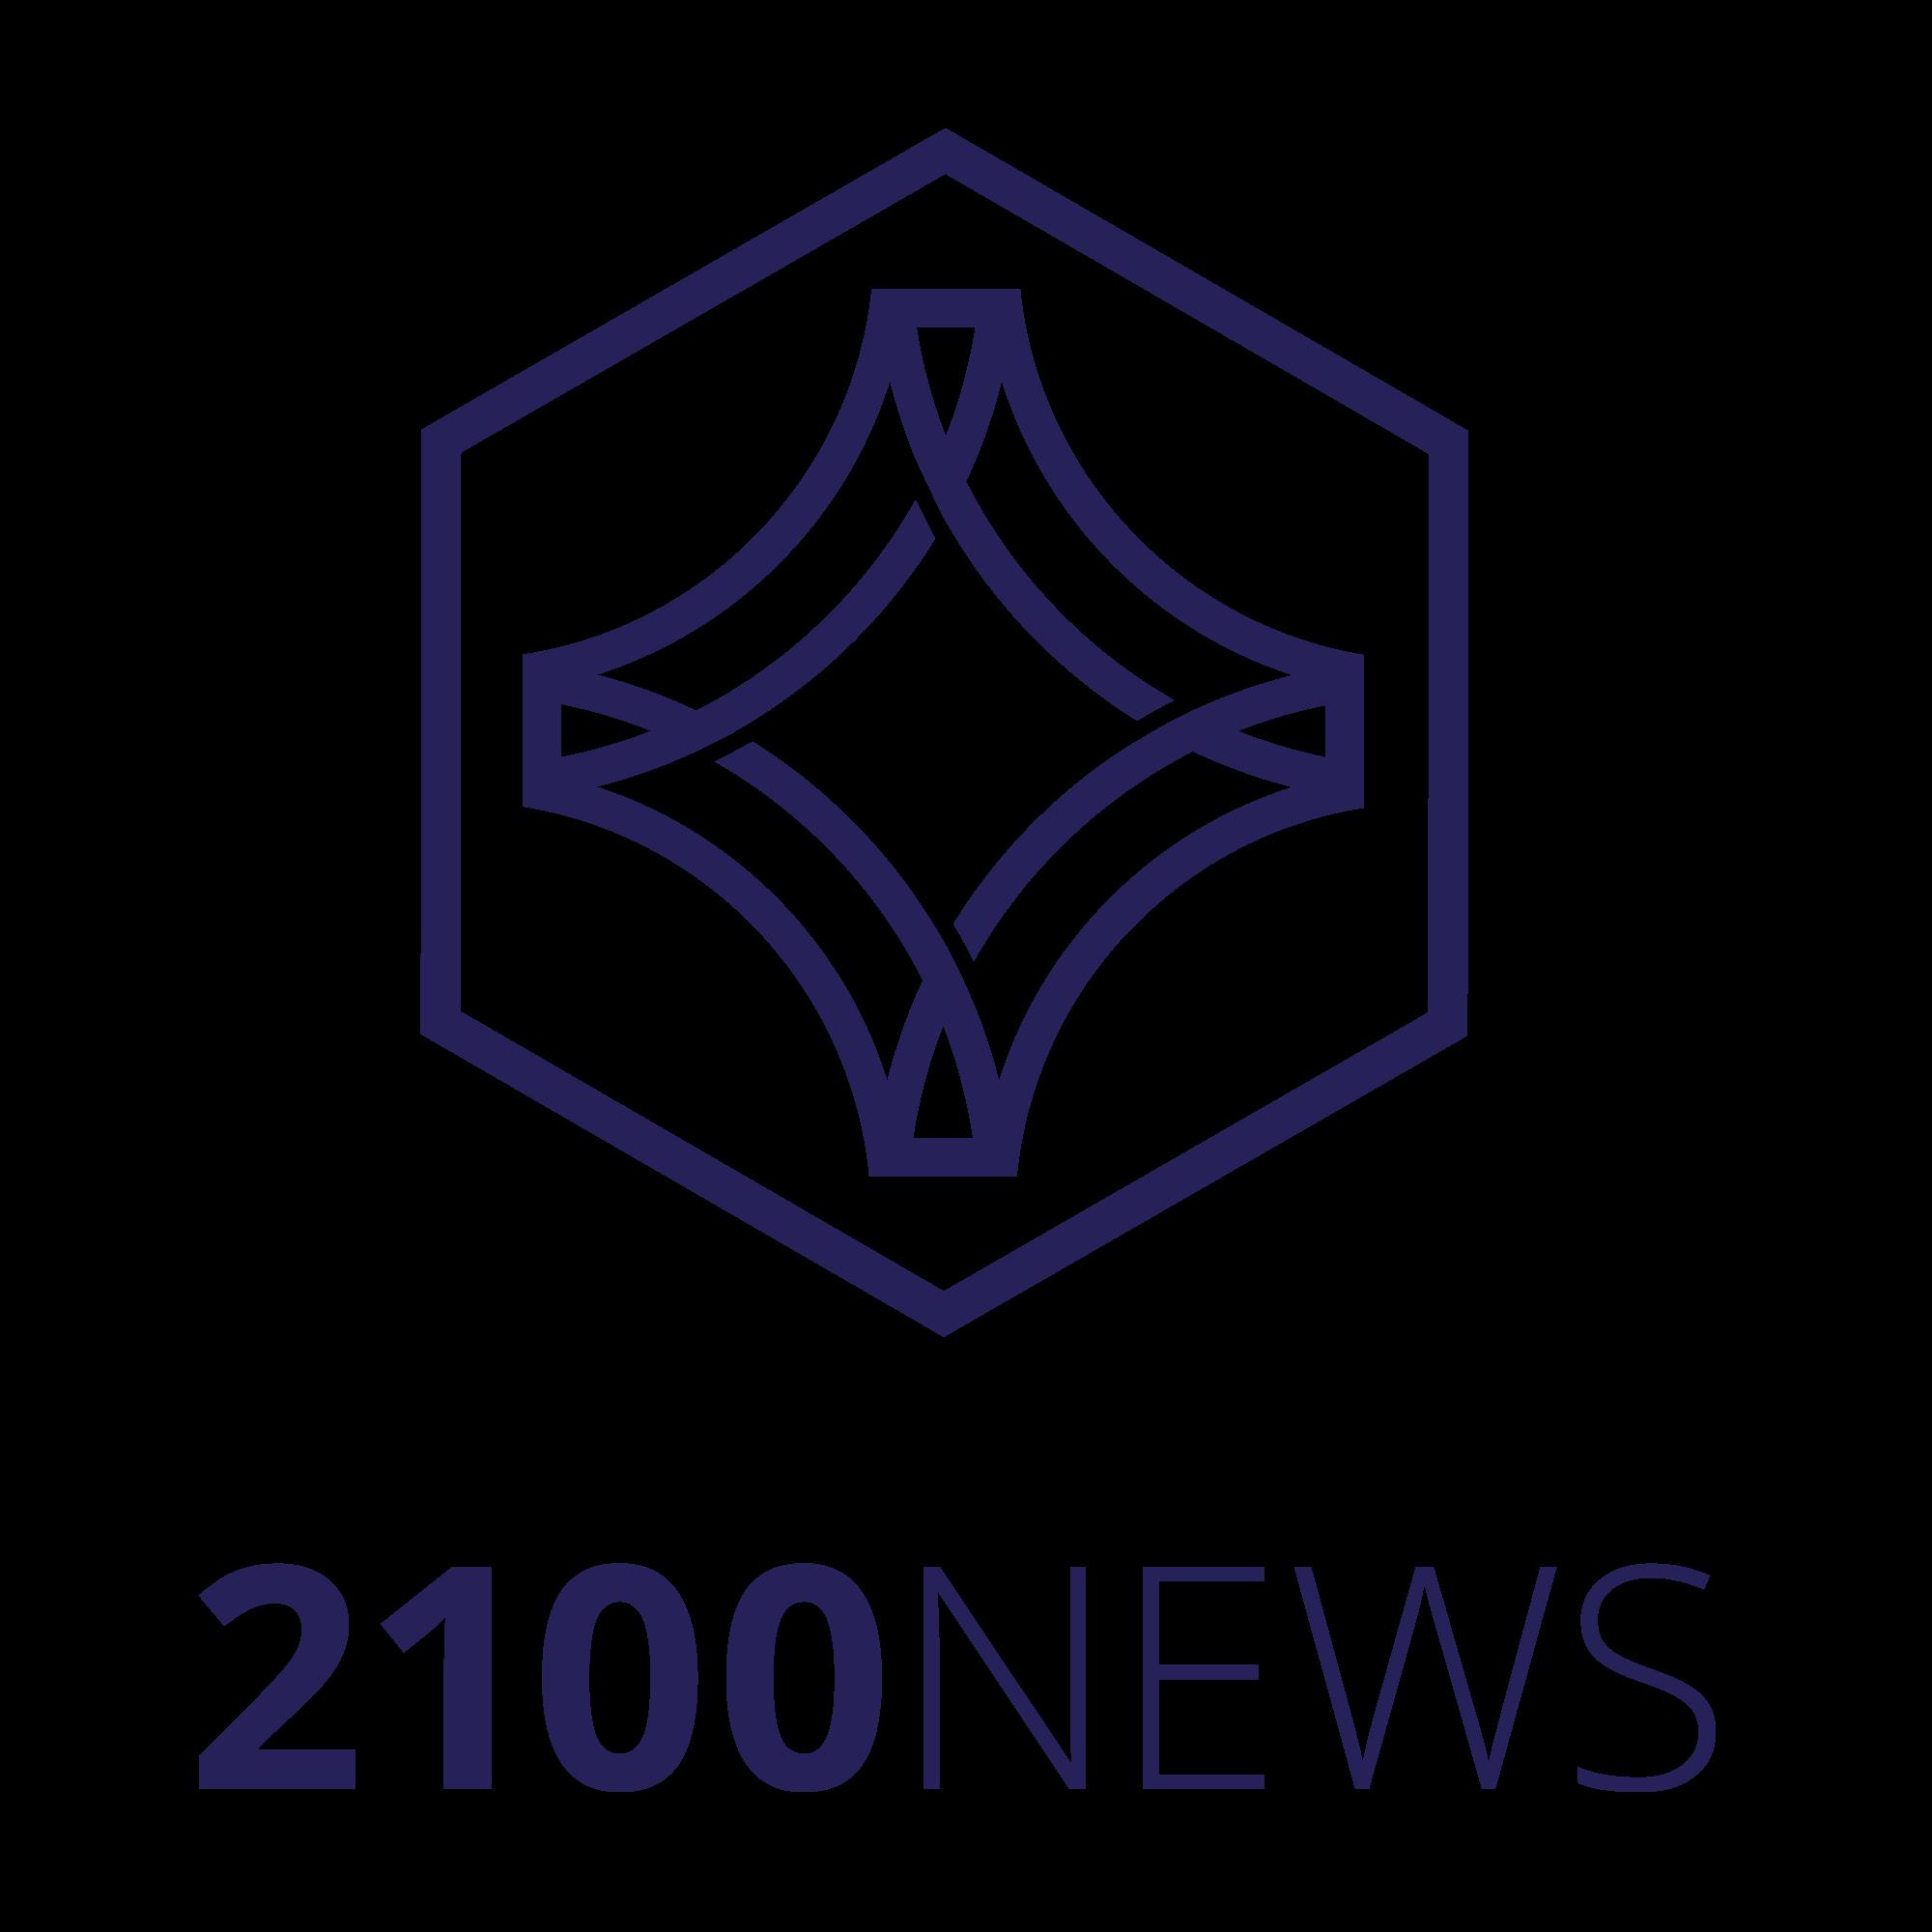 21000NEWS